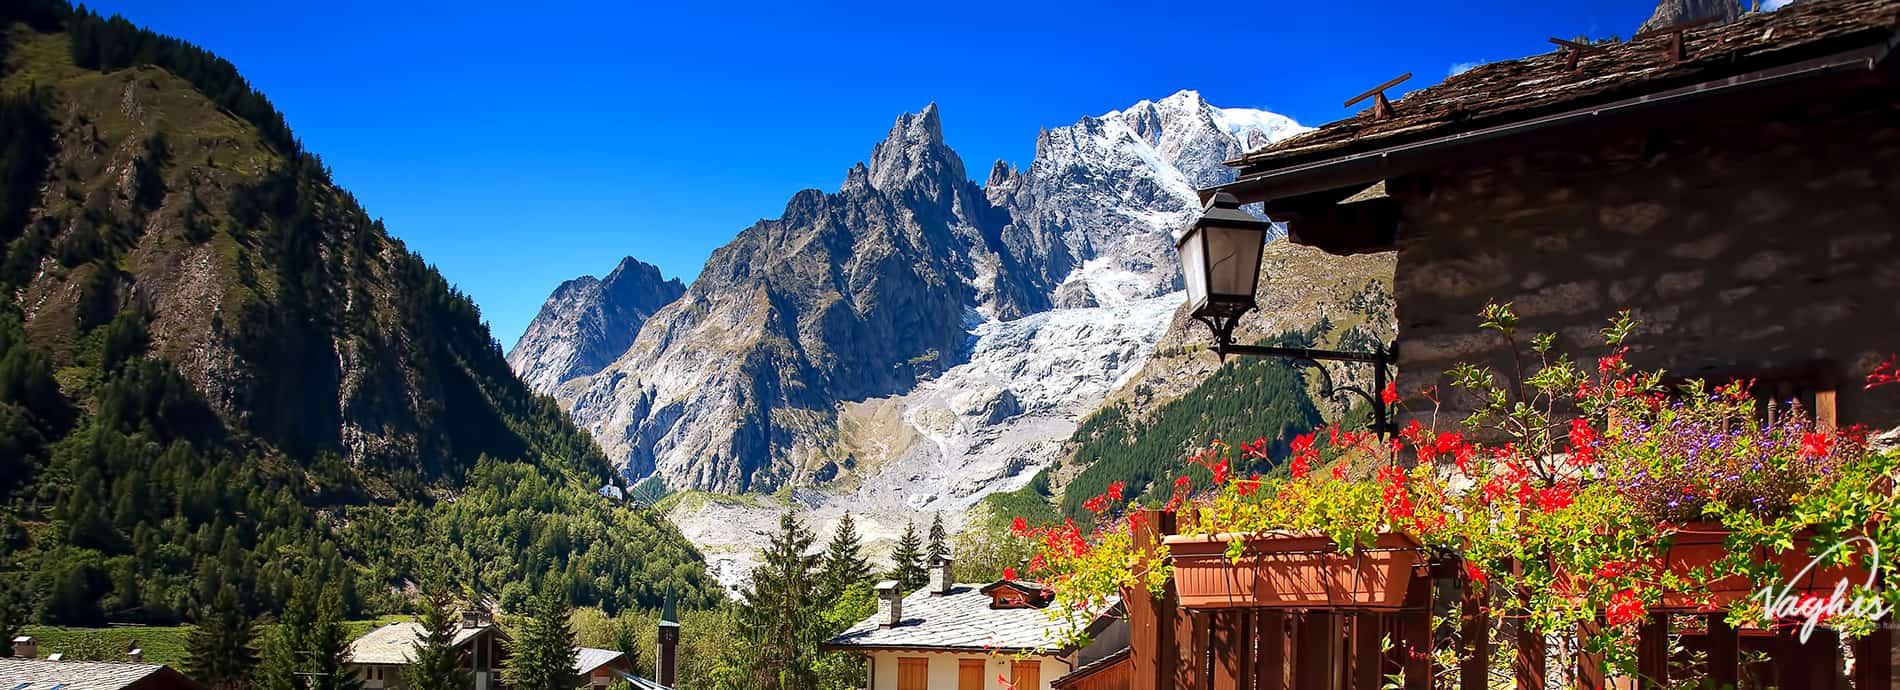 1courmayeur viaggi turismo italia tutti i diritti riservati 1